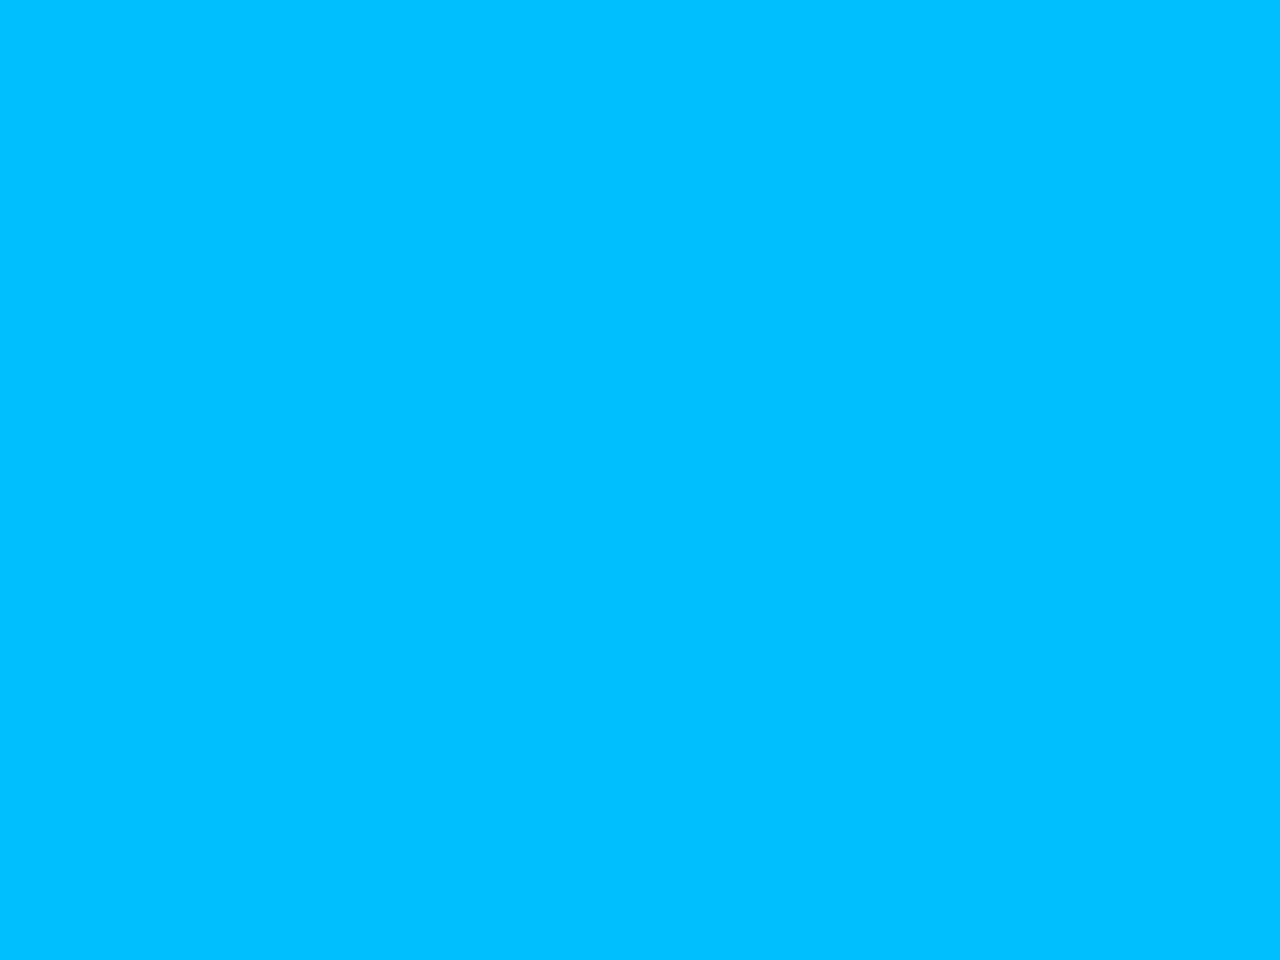 1280x960 Capri Solid Color Background